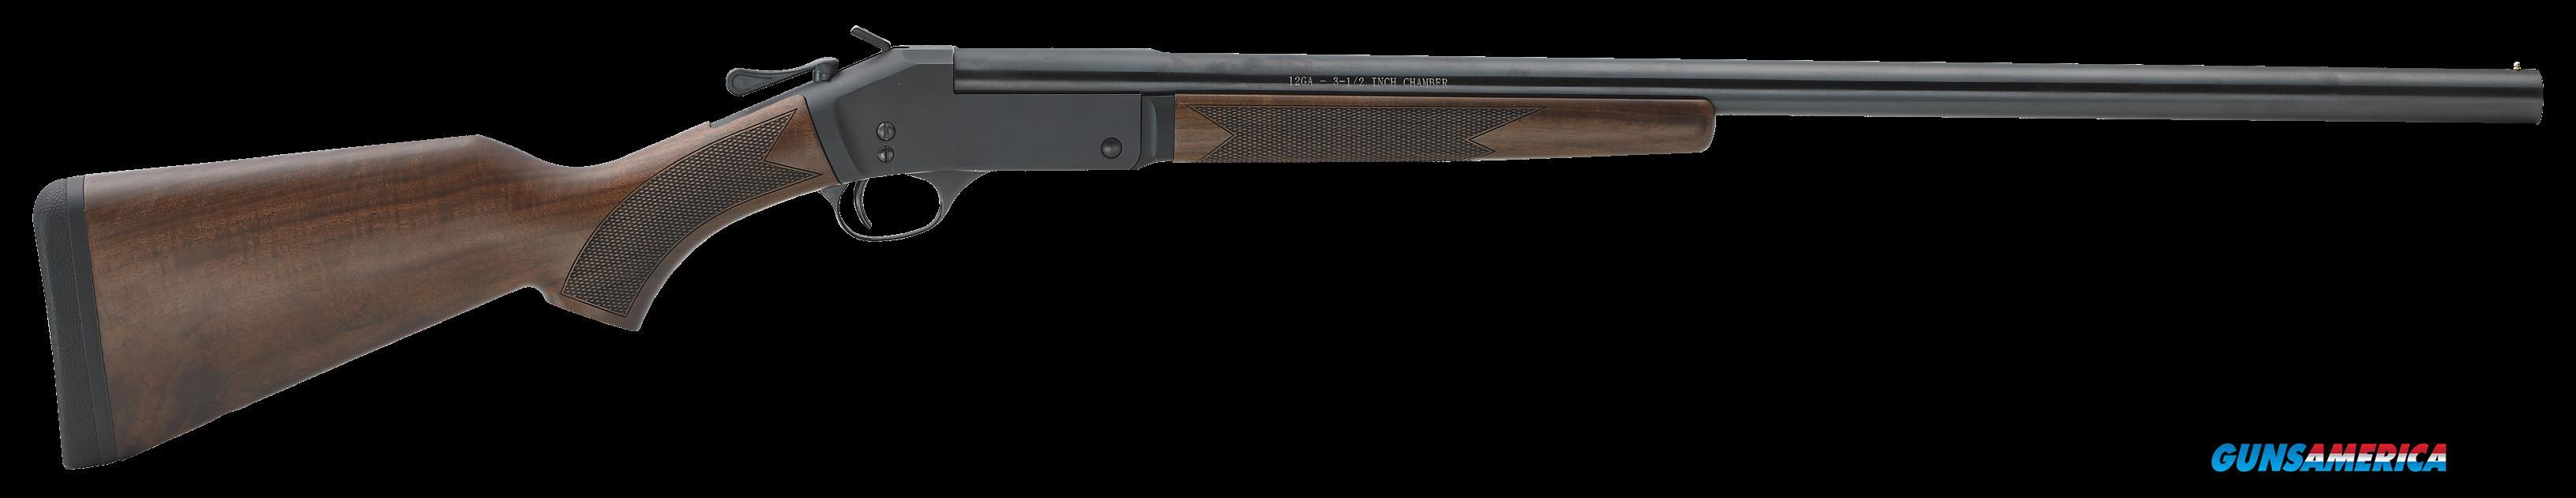 Henry Single Shot, Henry H01520    Single Shot 20ga Steel  Guns > Pistols > 1911 Pistol Copies (non-Colt)